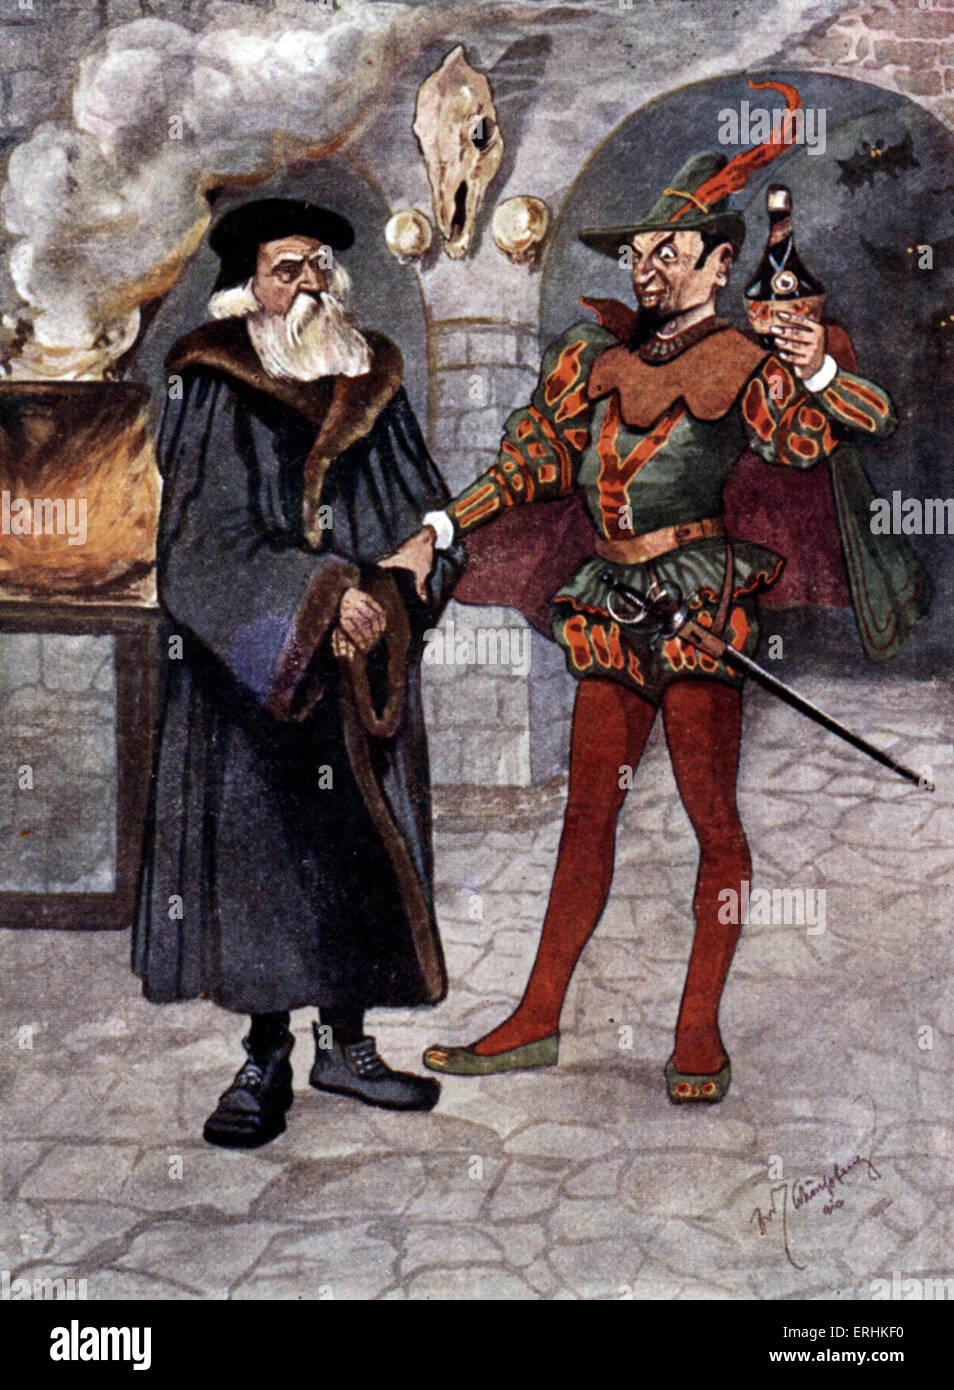 Advert based on 'Faust' scene - play by Johann Wolfgang Goethe. Mephistopheles, the devil, tempting Faust - Stock Image